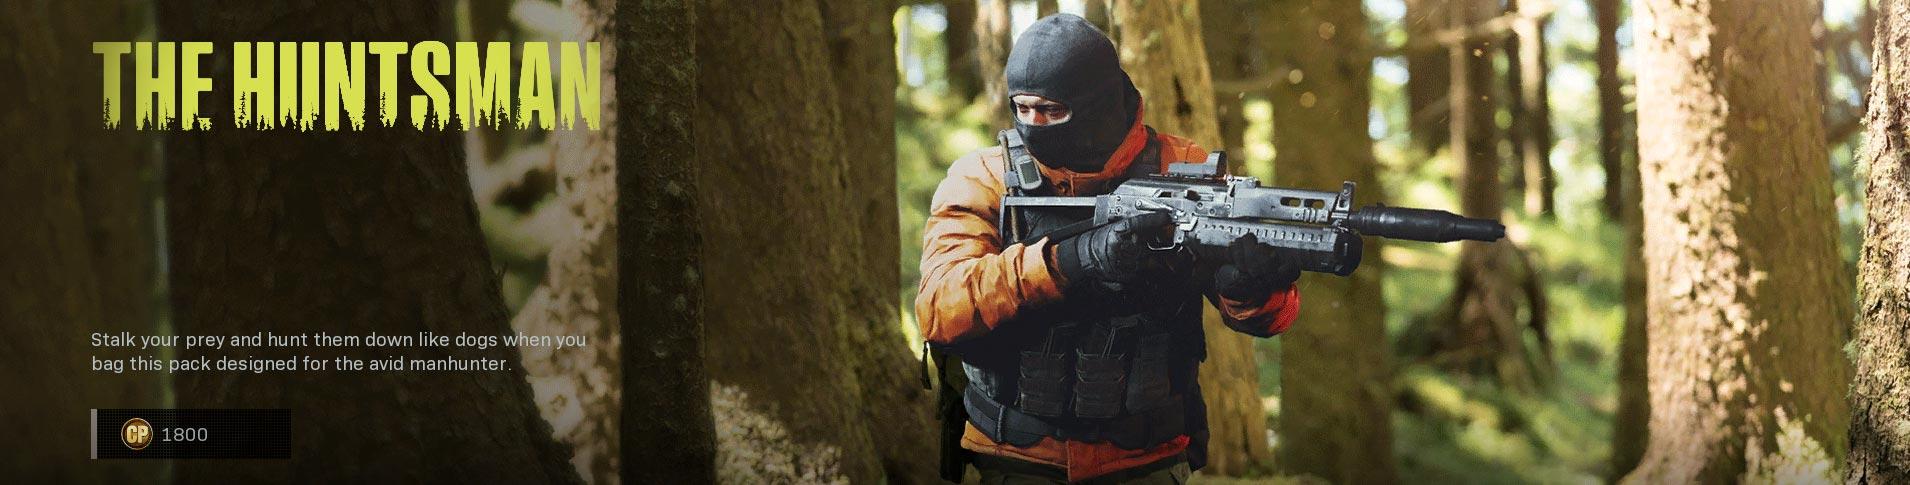 The huntsman featured call of duty modern warfare item bundle